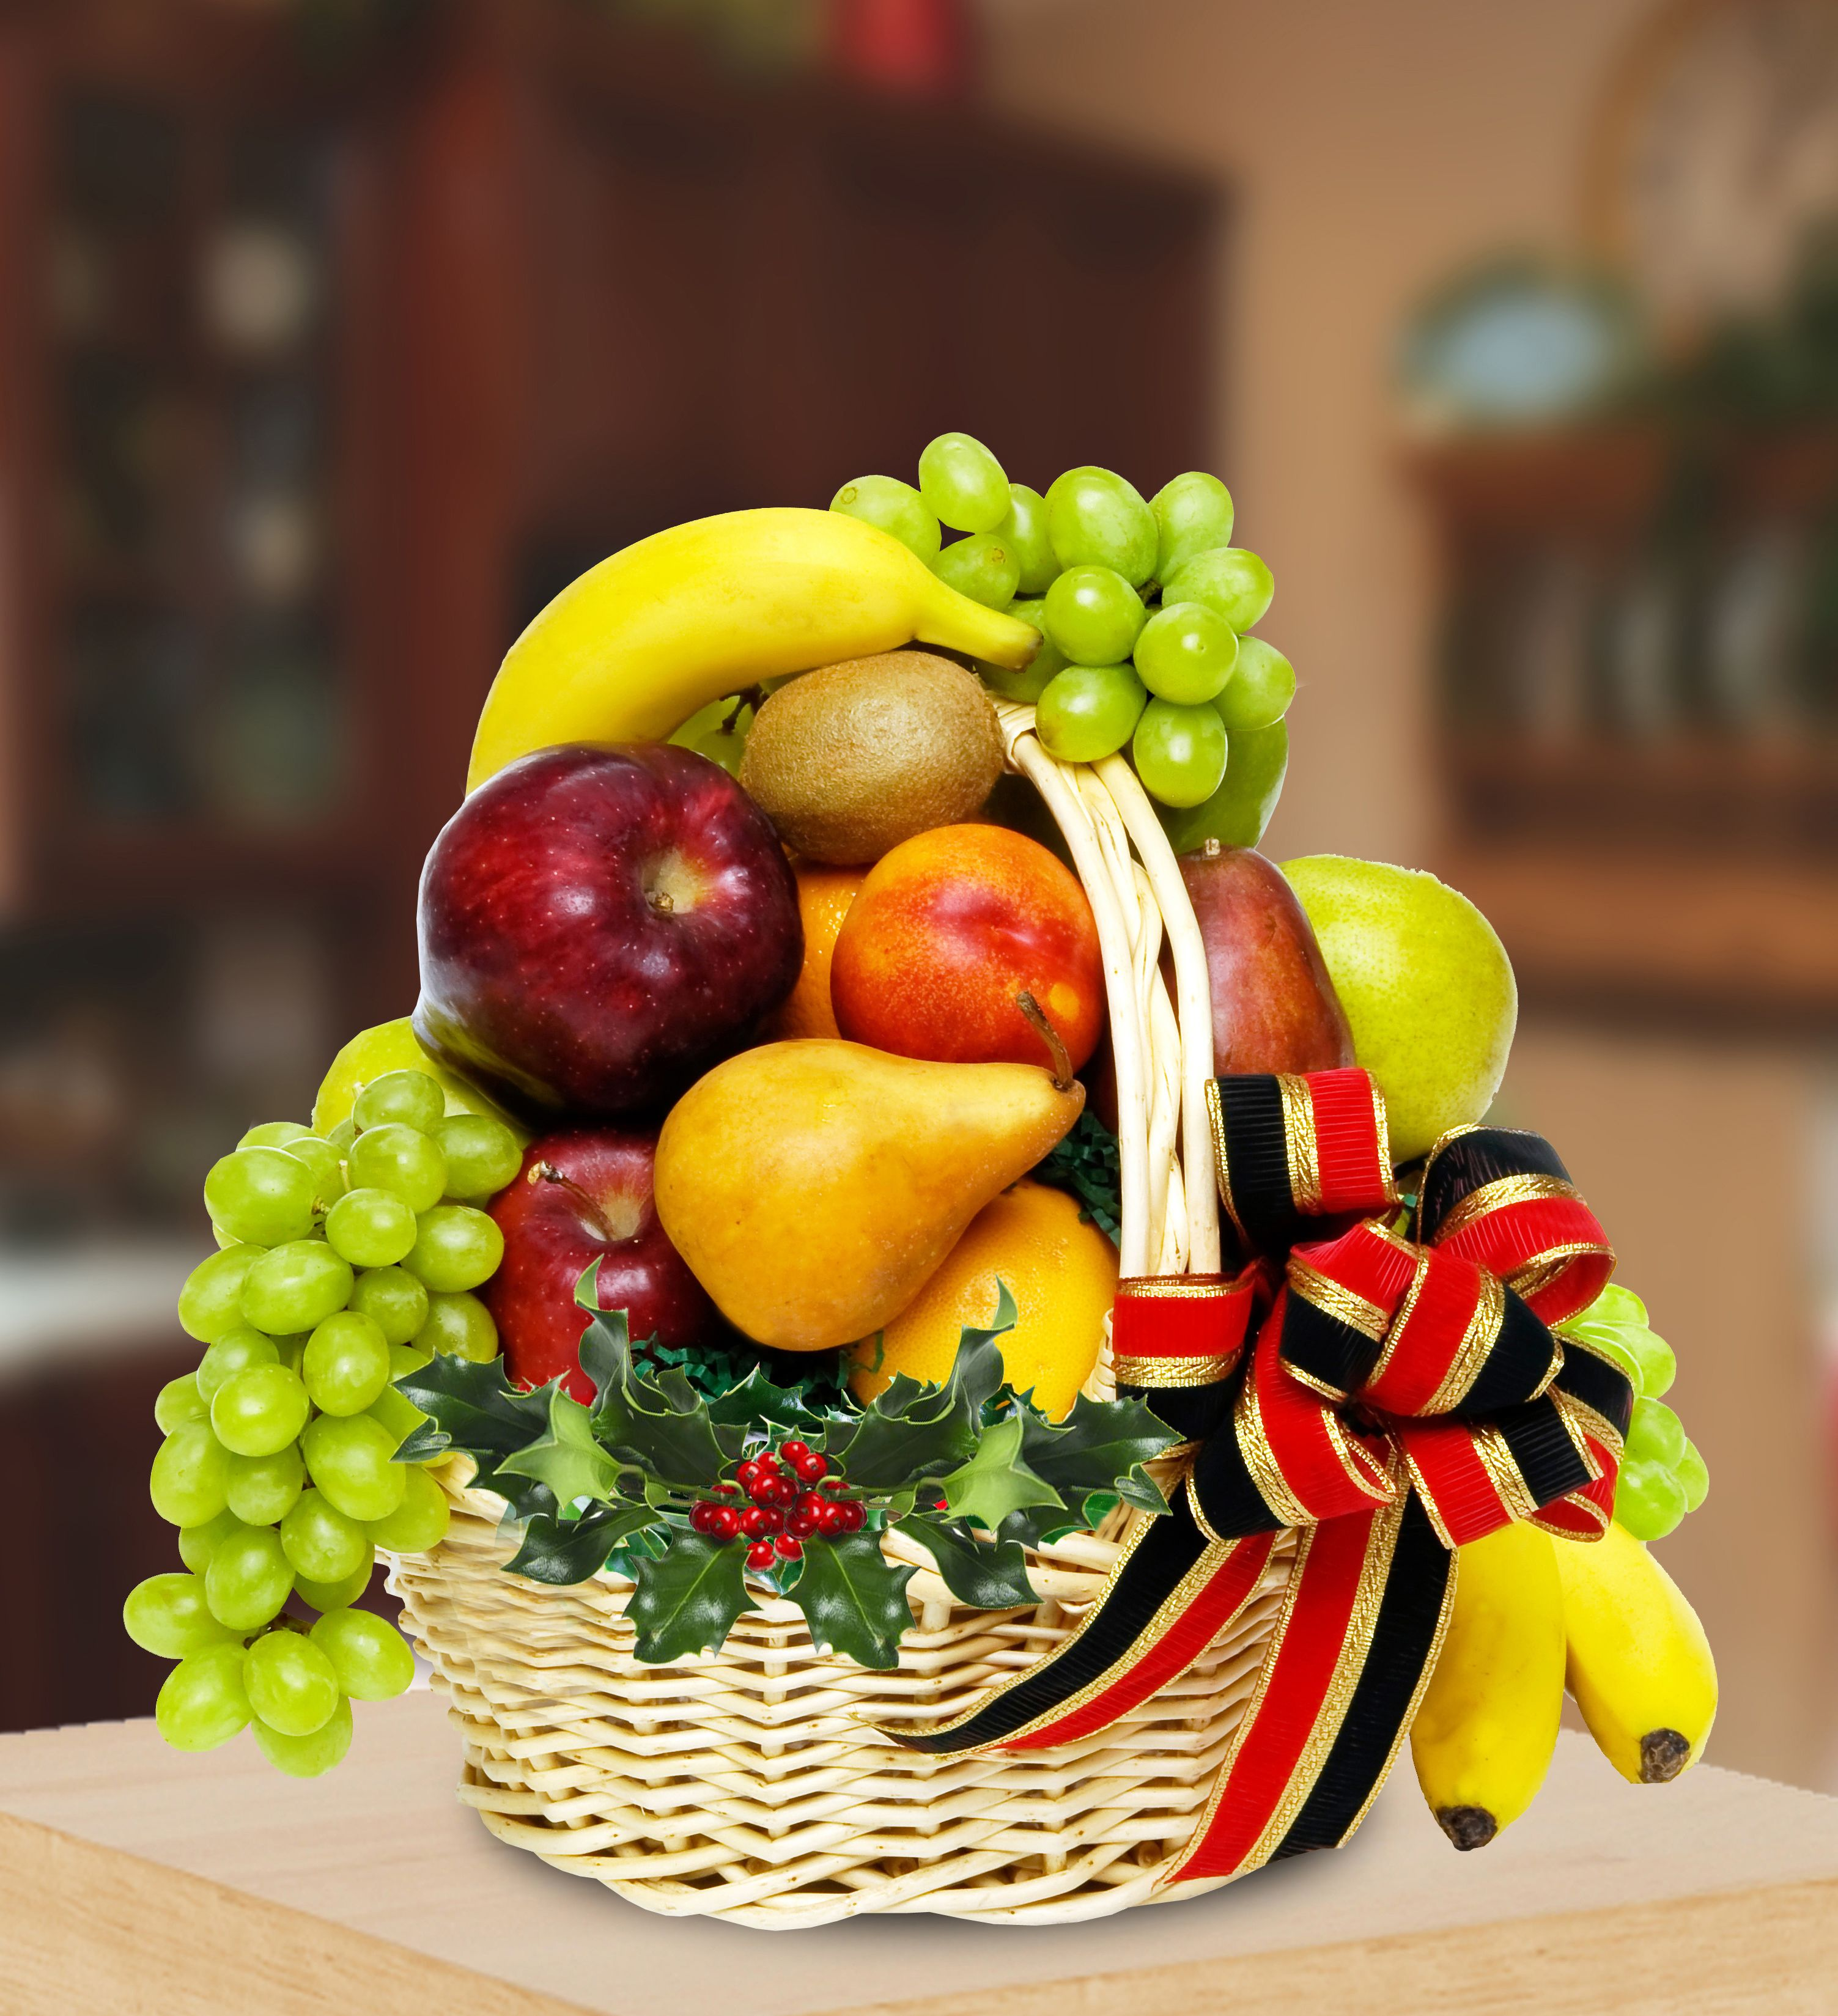 Hoogasian Flowers Holiday Fruit Healthy Fruits Fruit Basket Gift